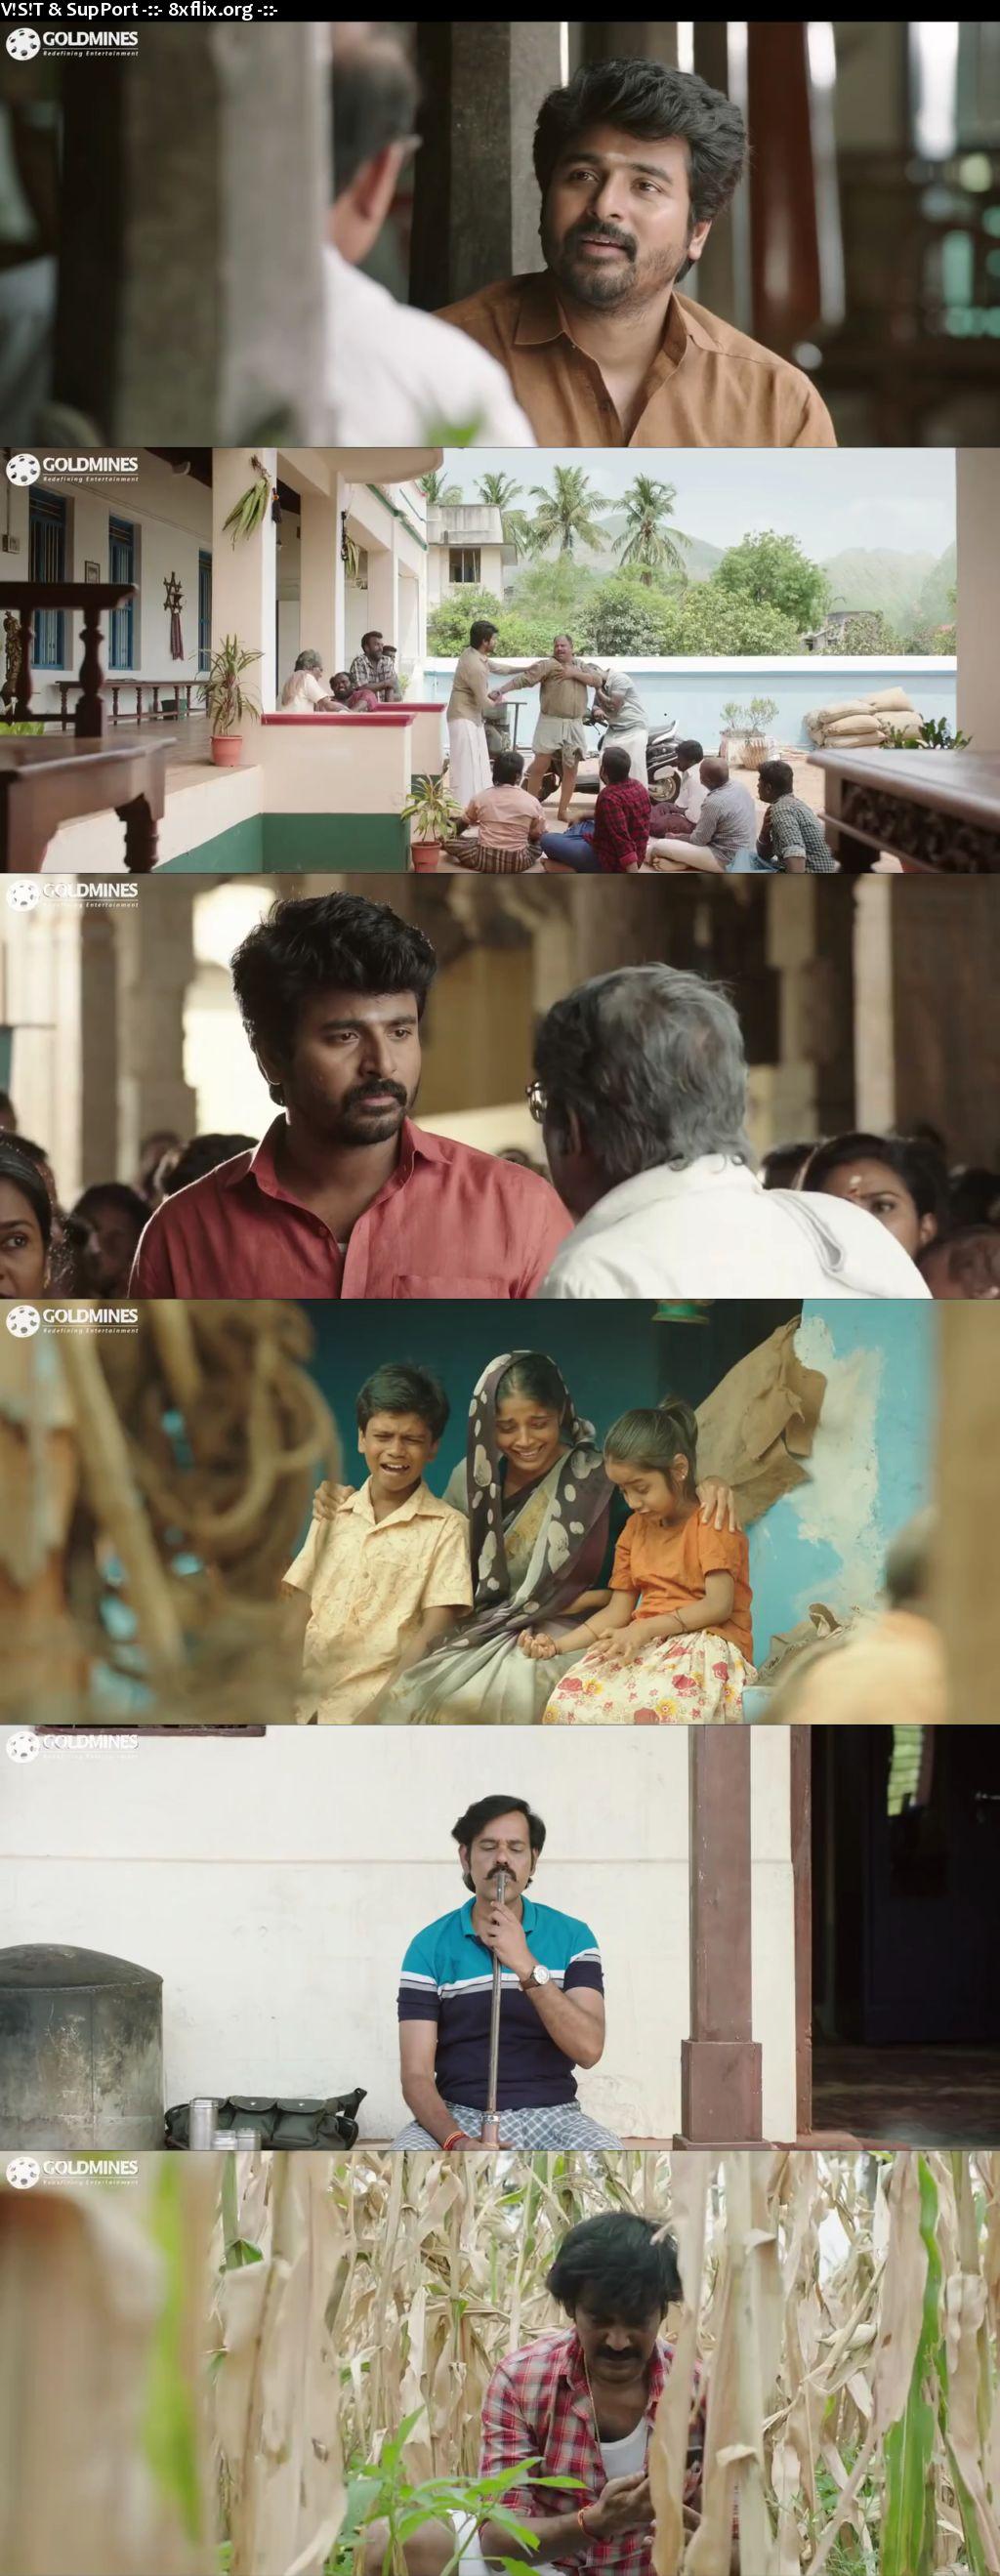 Ek Hazaaron Mein Meri Behna Hai 2021 Full Movie Hindi Dubbed 720p 480p HDRip